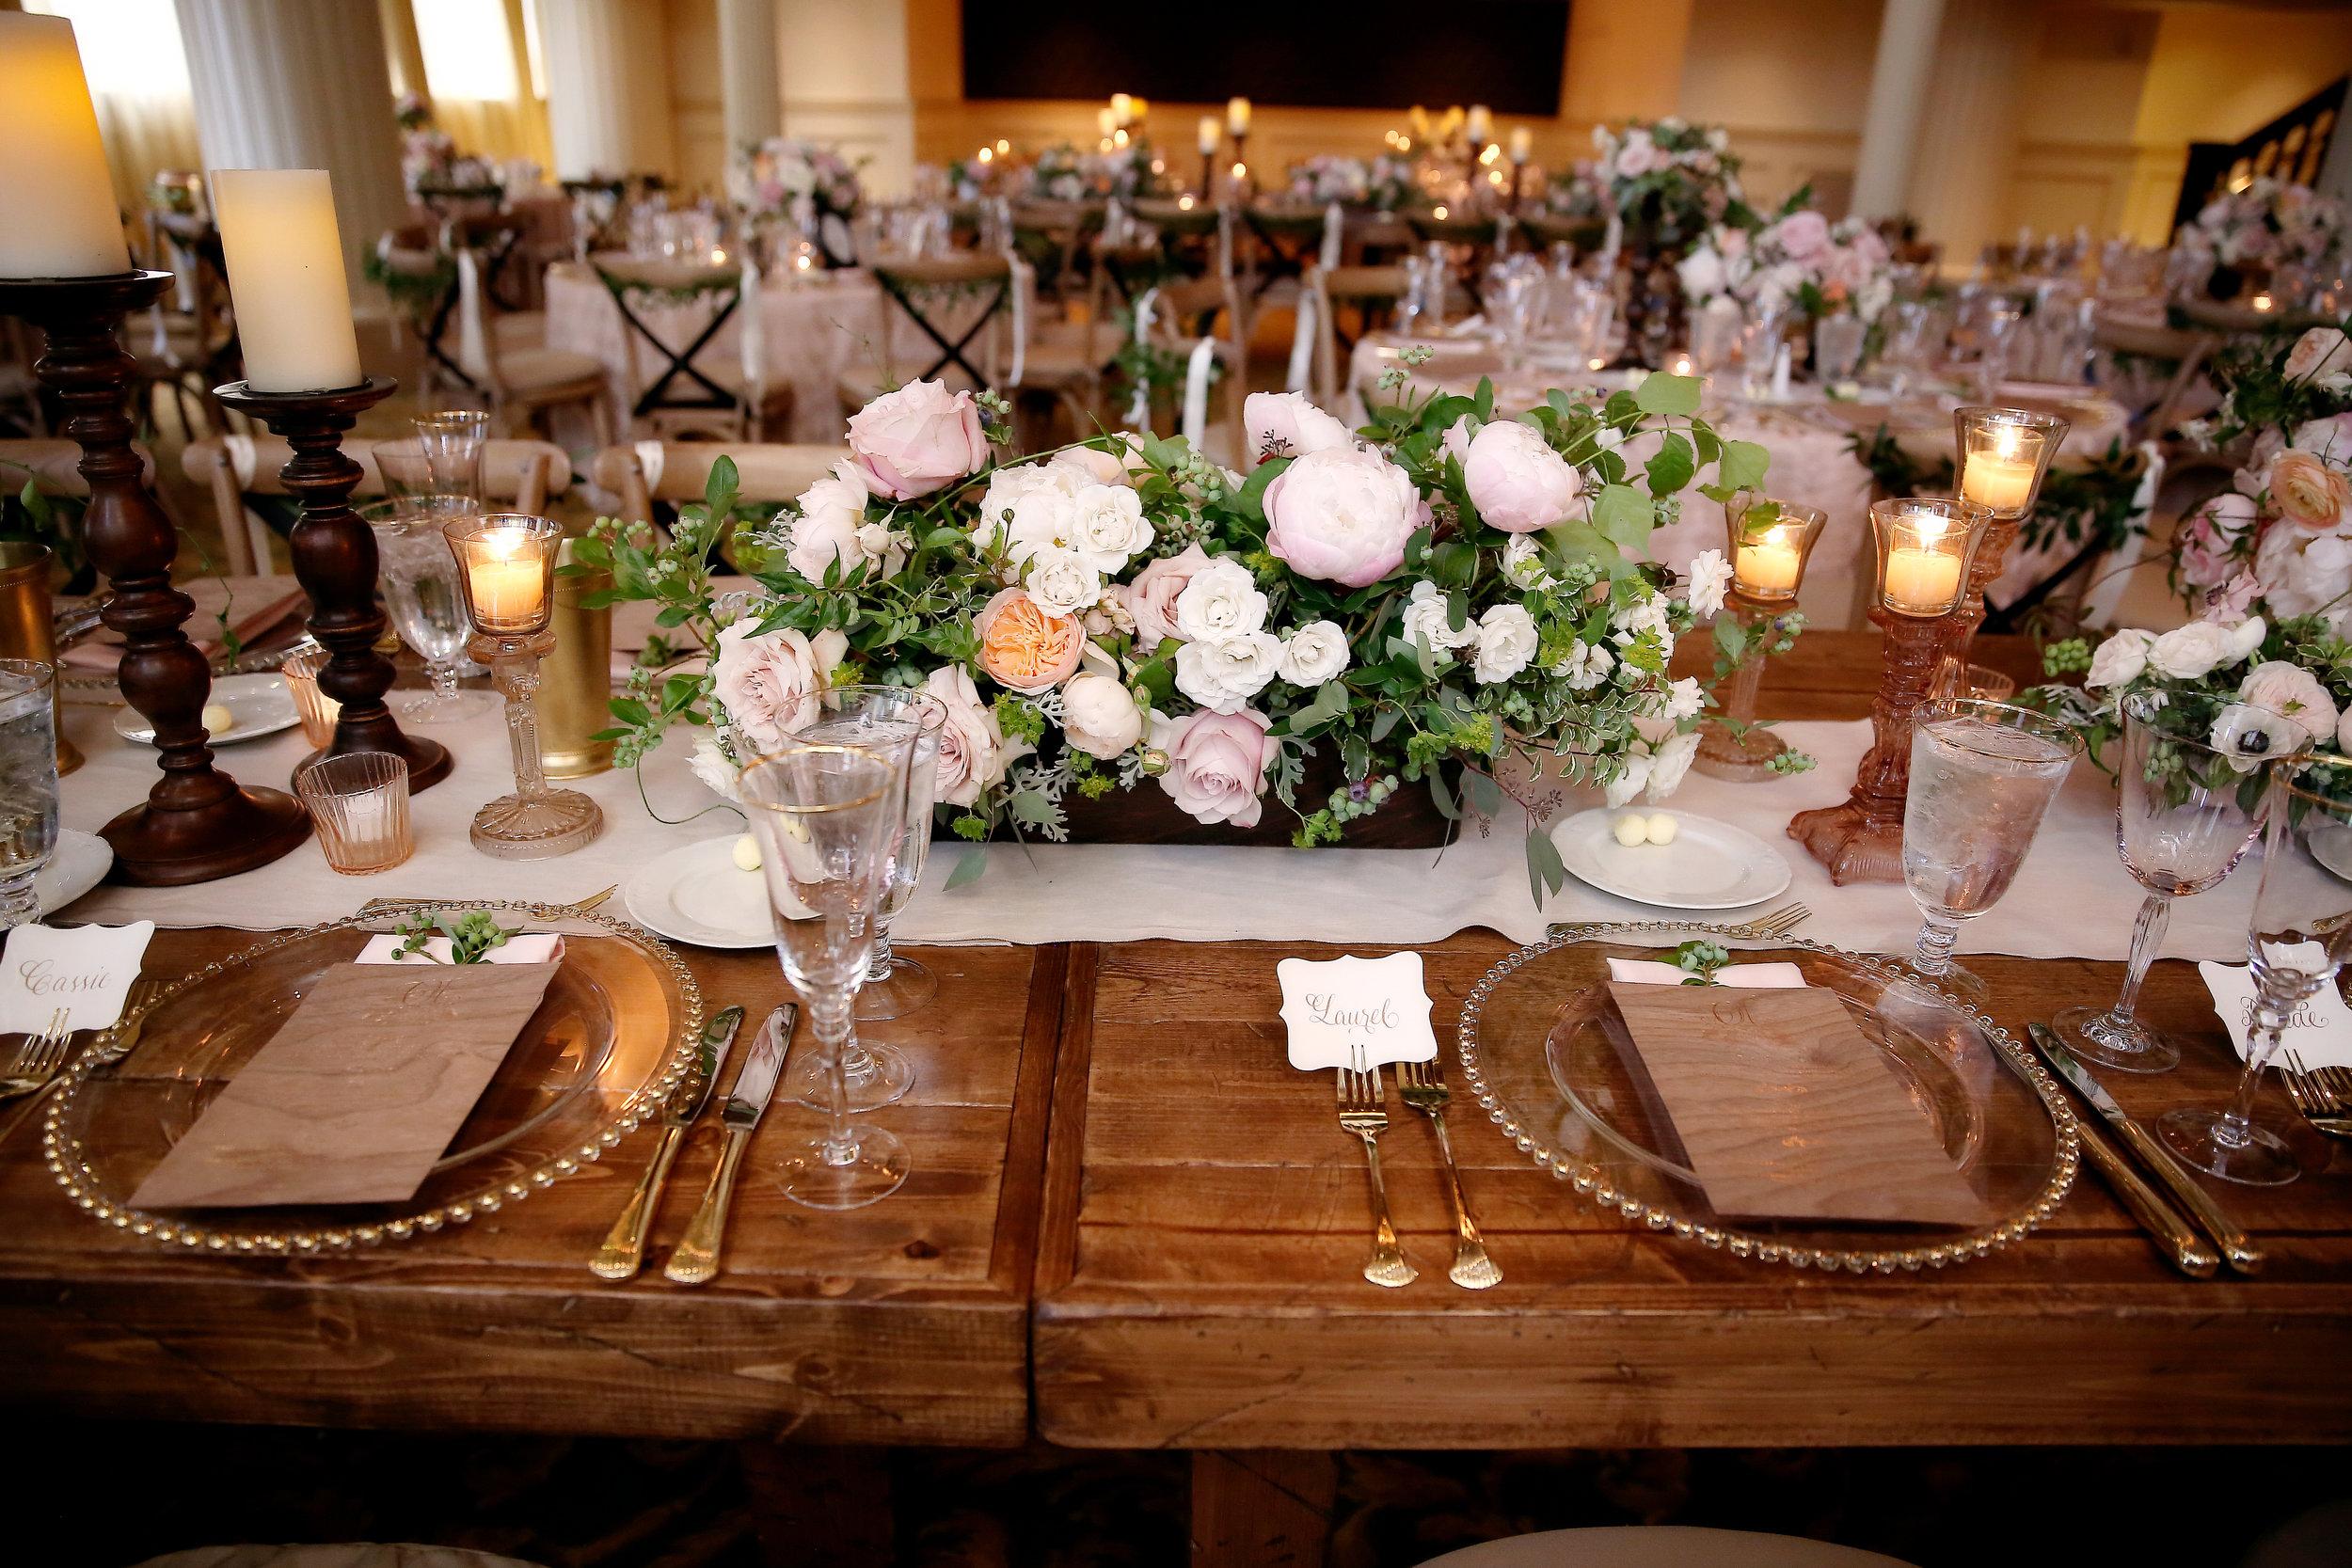 Adam & Olivia: A Rustic Ballroom Wedding, The Knot